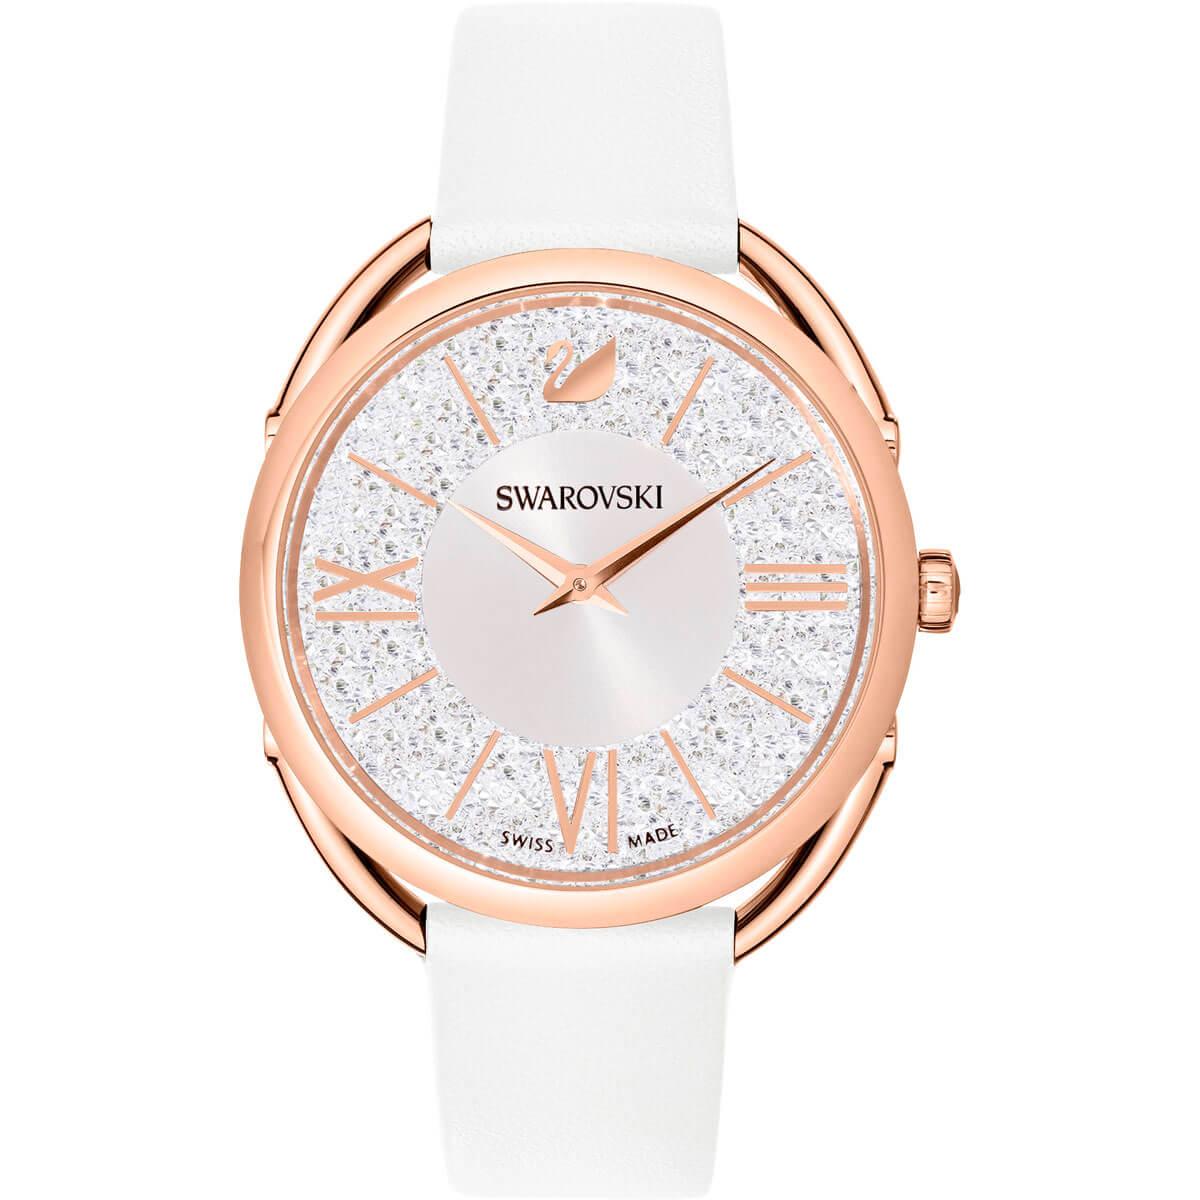 Swarovski Crystalline Glam Watch, Leather Strap, White, Rose Gold